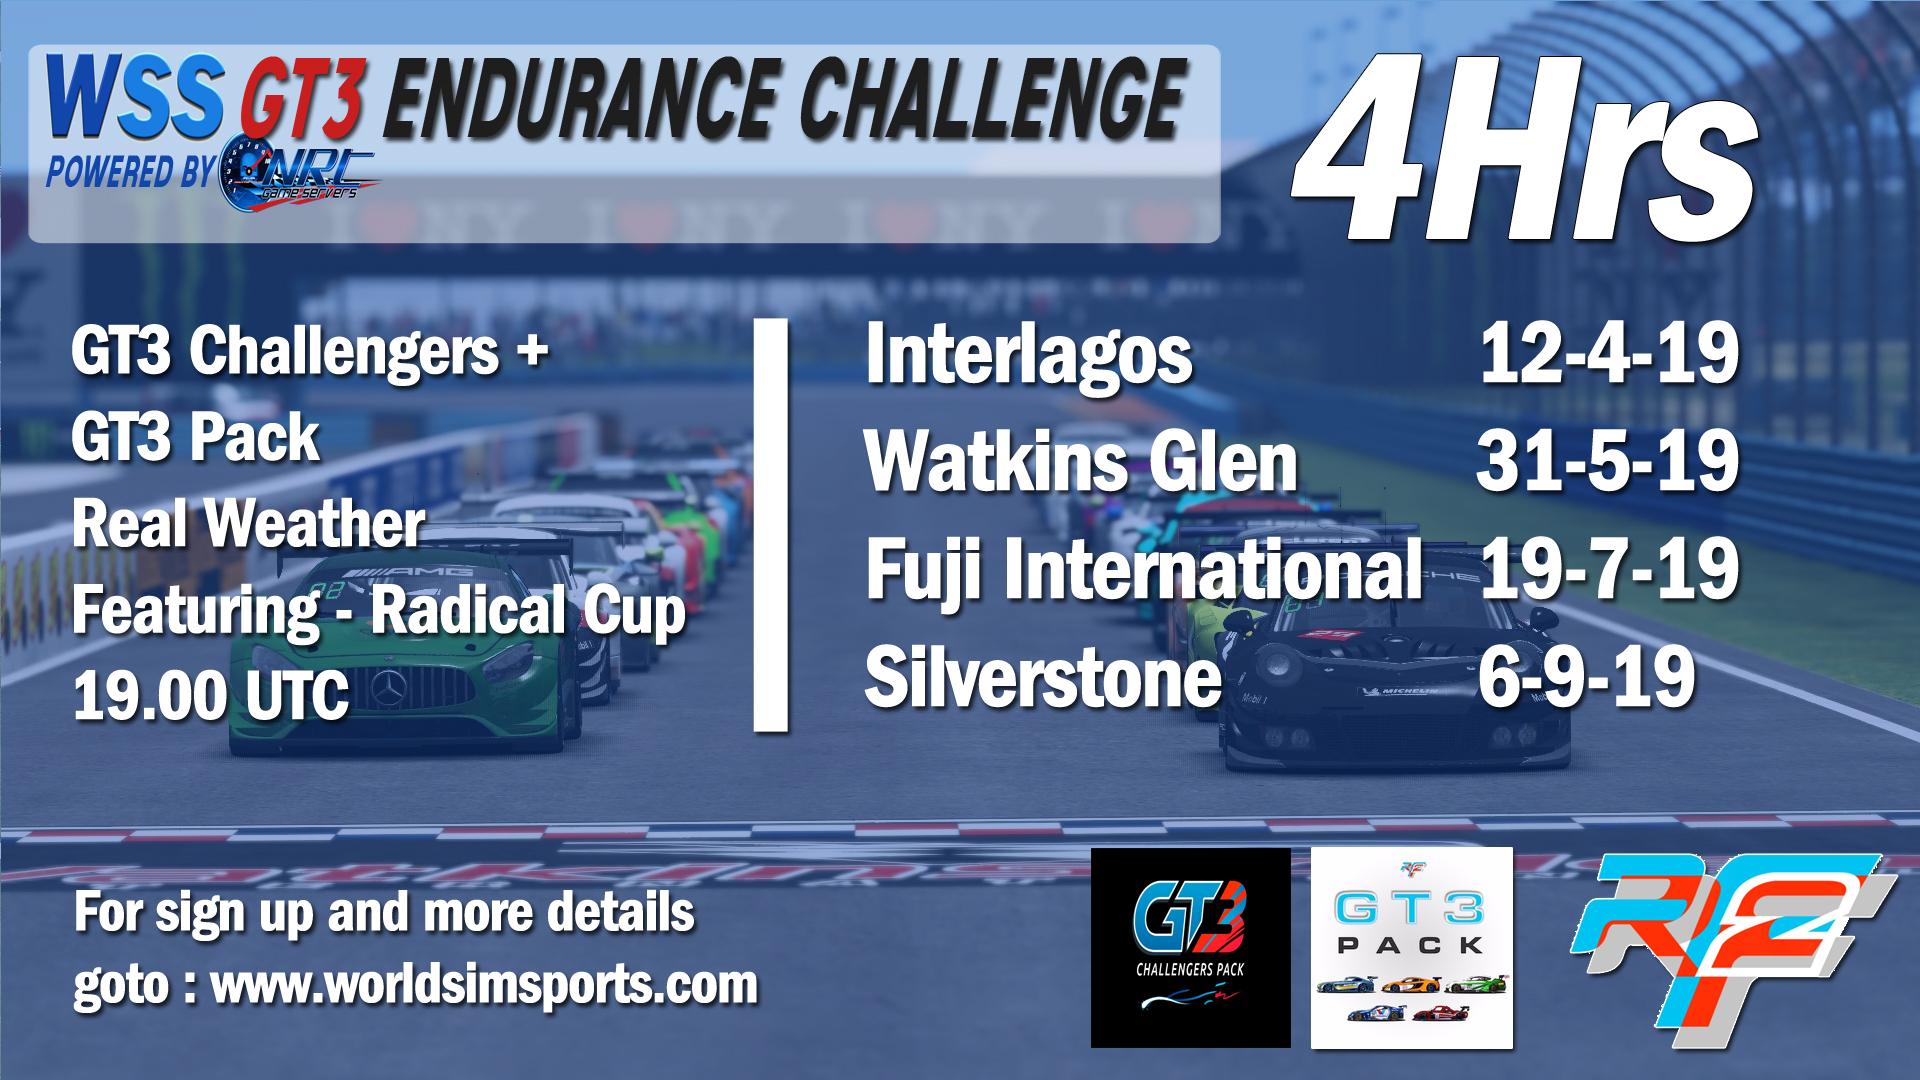 wss gt3 endurance Challenge flyer.jpg